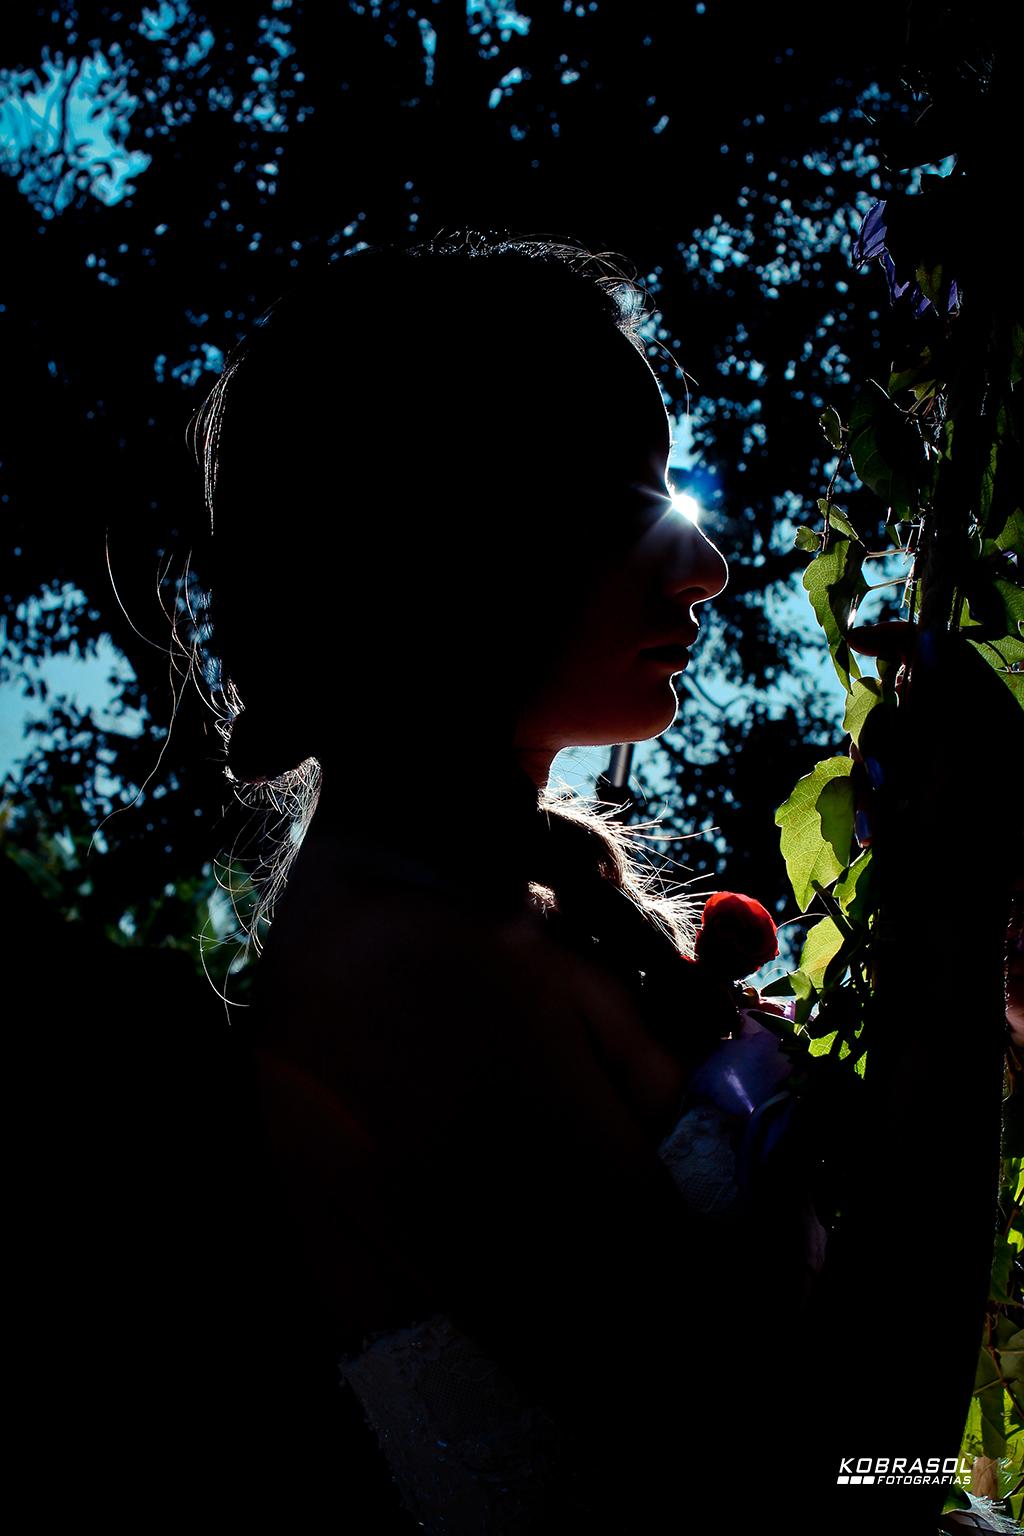 pre15. 15anos, quinzeanos, fotosdedebutante, debutante, fotosparaaniversario, aniversariodequinzeanos, adolescente